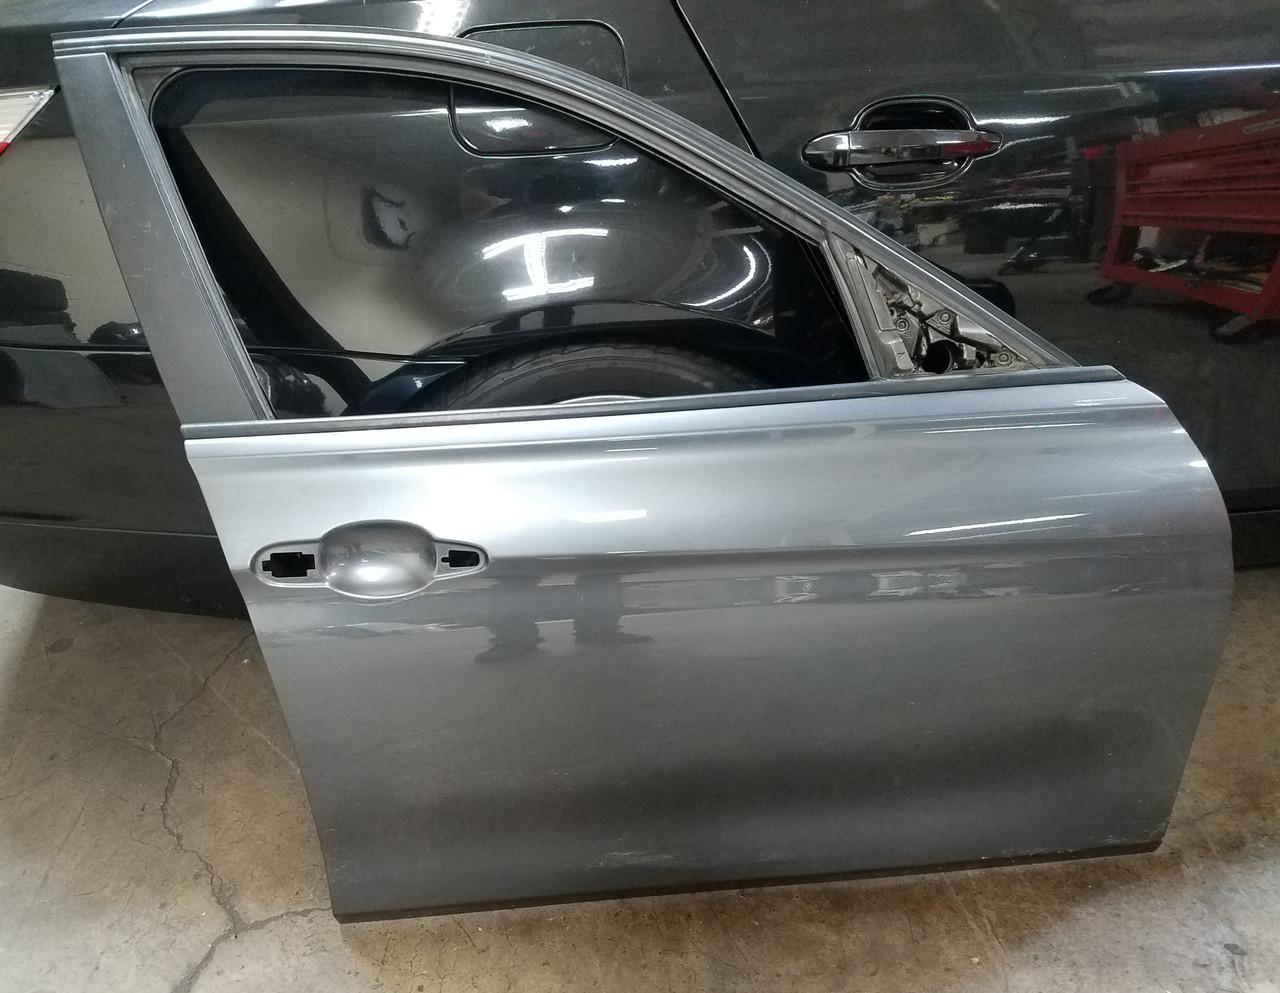 2012-17 BMW F30 F31 335i 328i PASSENGER FRONT DOOR SHELL